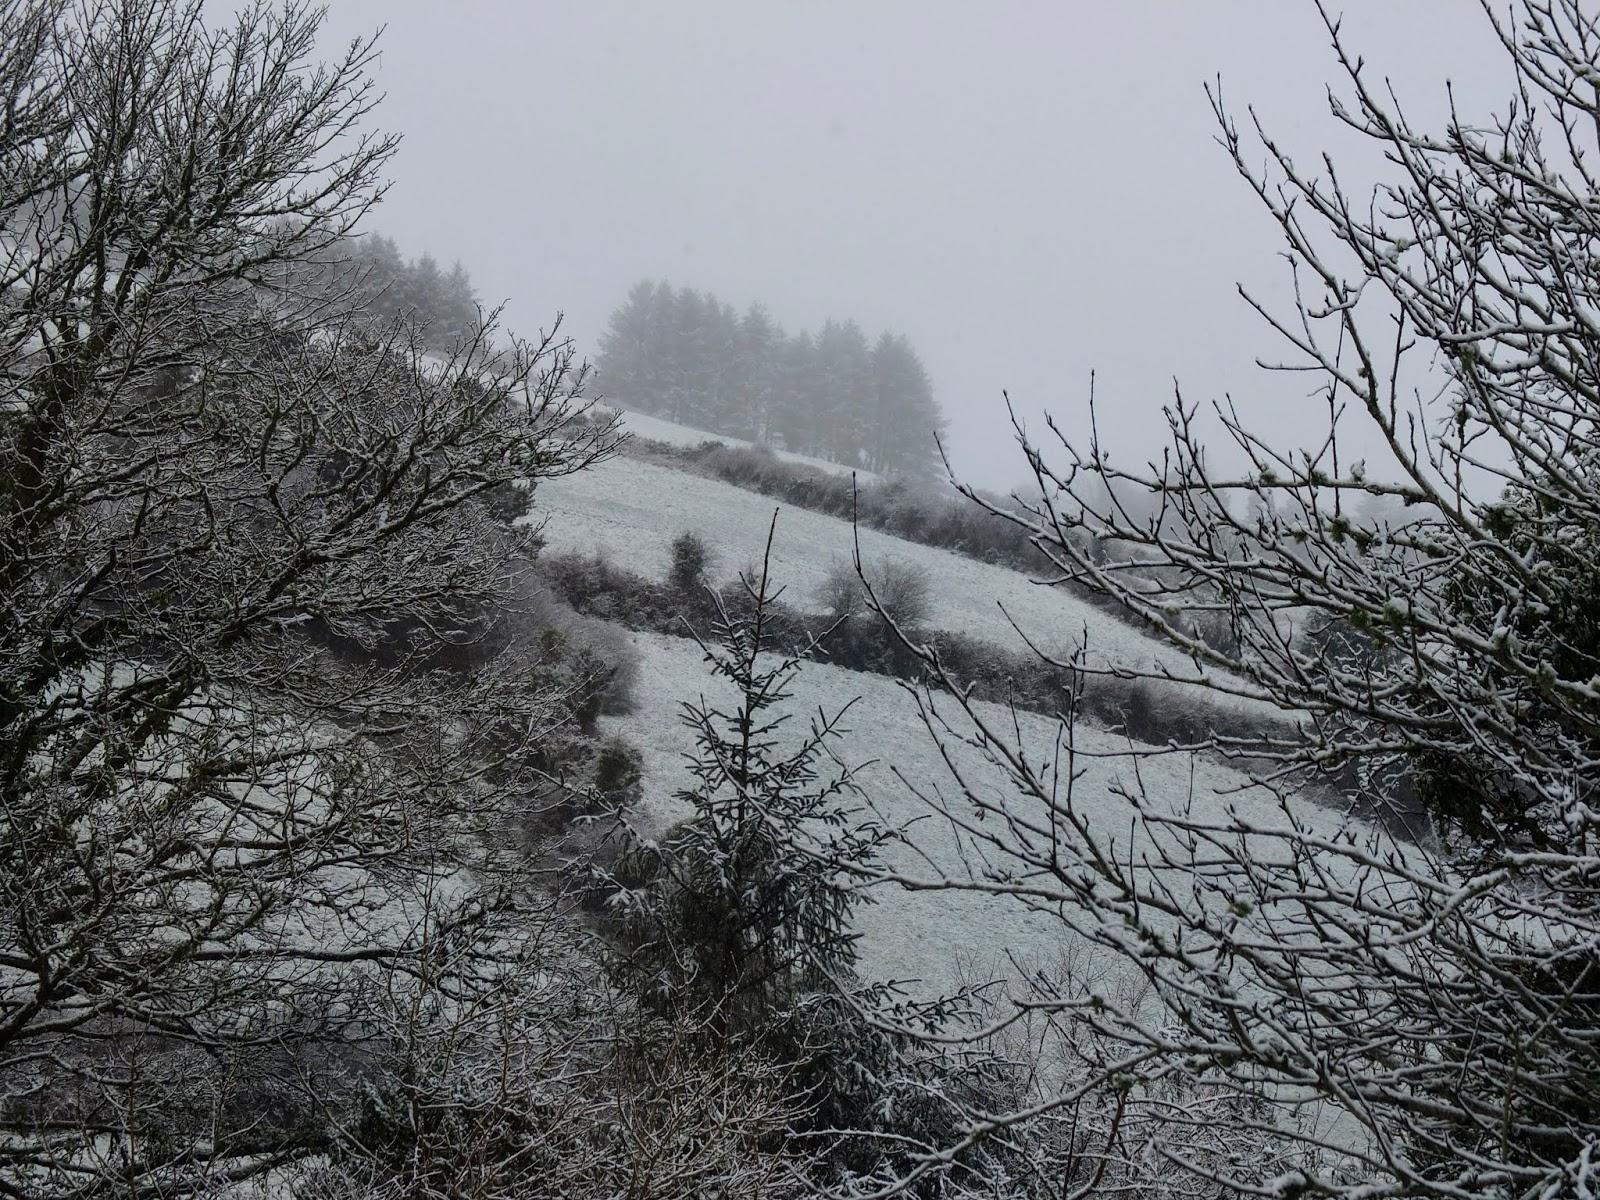 Snowy hillside landscape through a hedge.